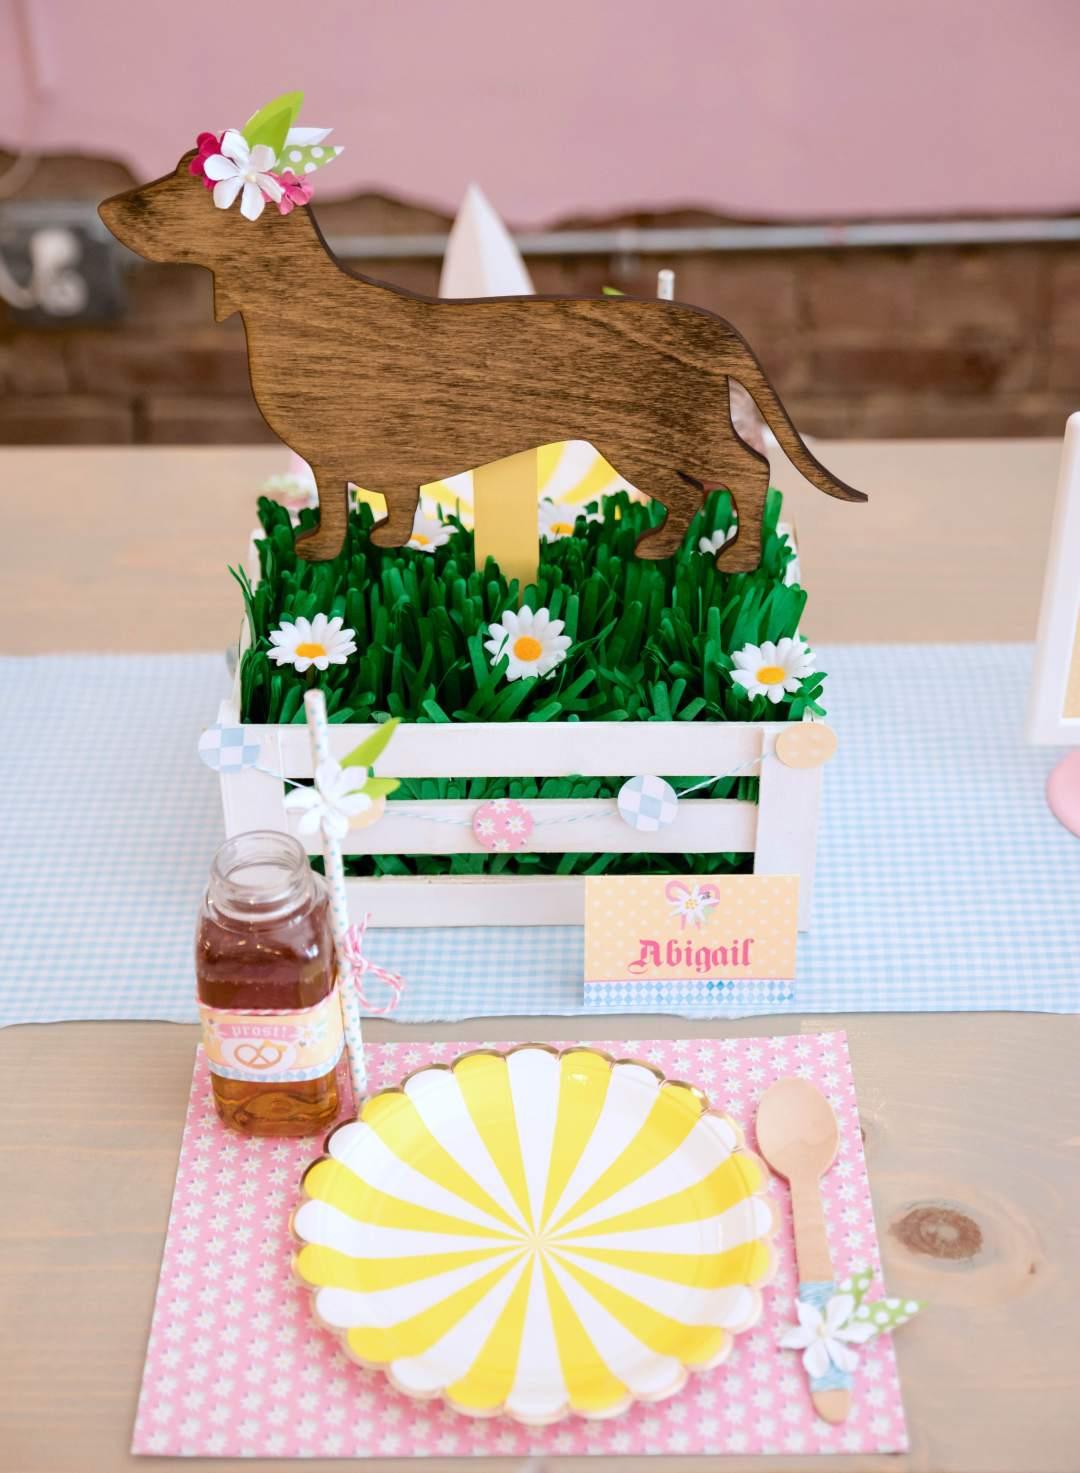 Everyday Party Magazine Oktoberfest Celebration by Made of Sugar and Spice